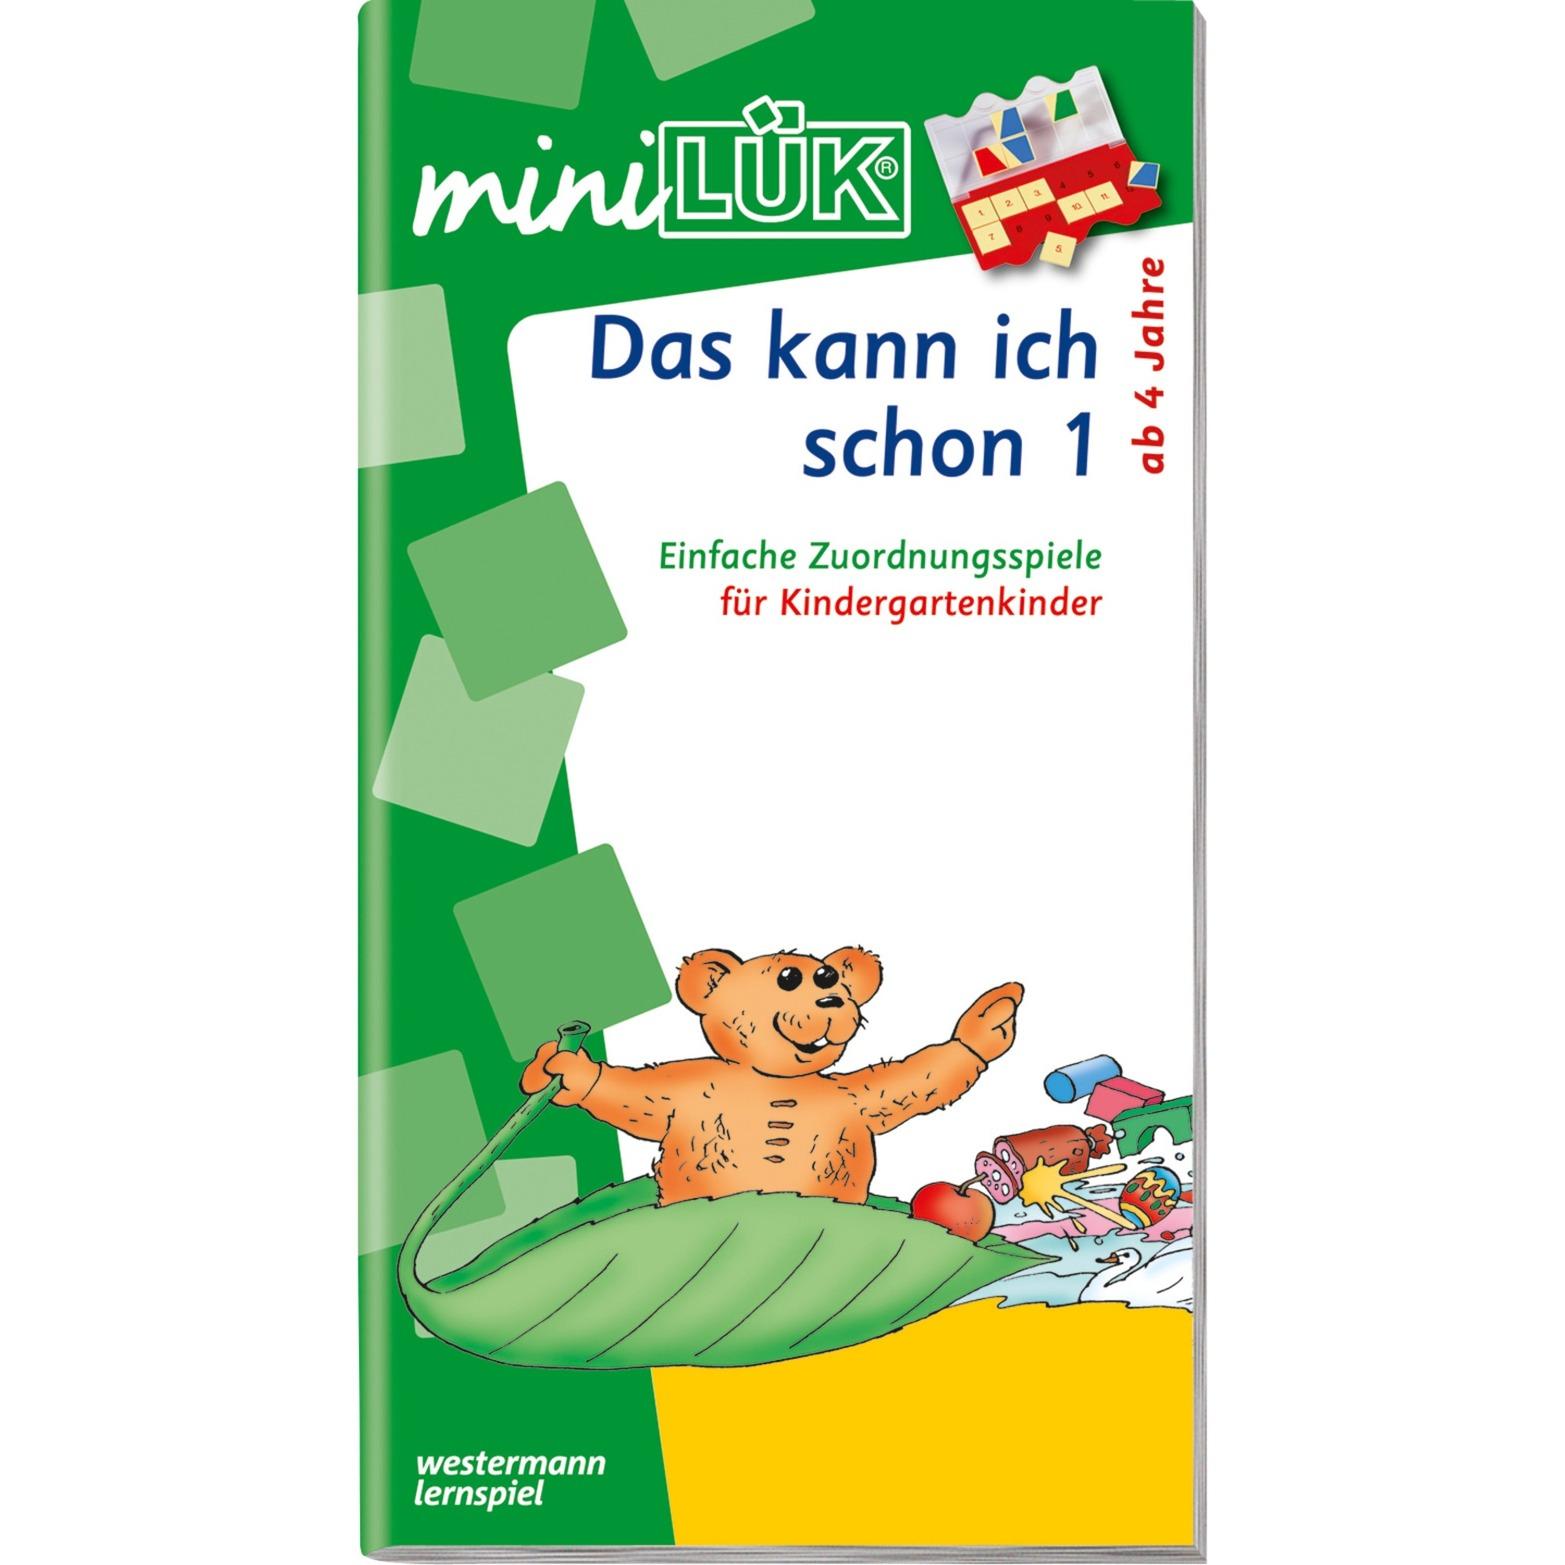 WESTERMANN miniLÜK-Heft: Das kann ich schon 1, Lernbuch